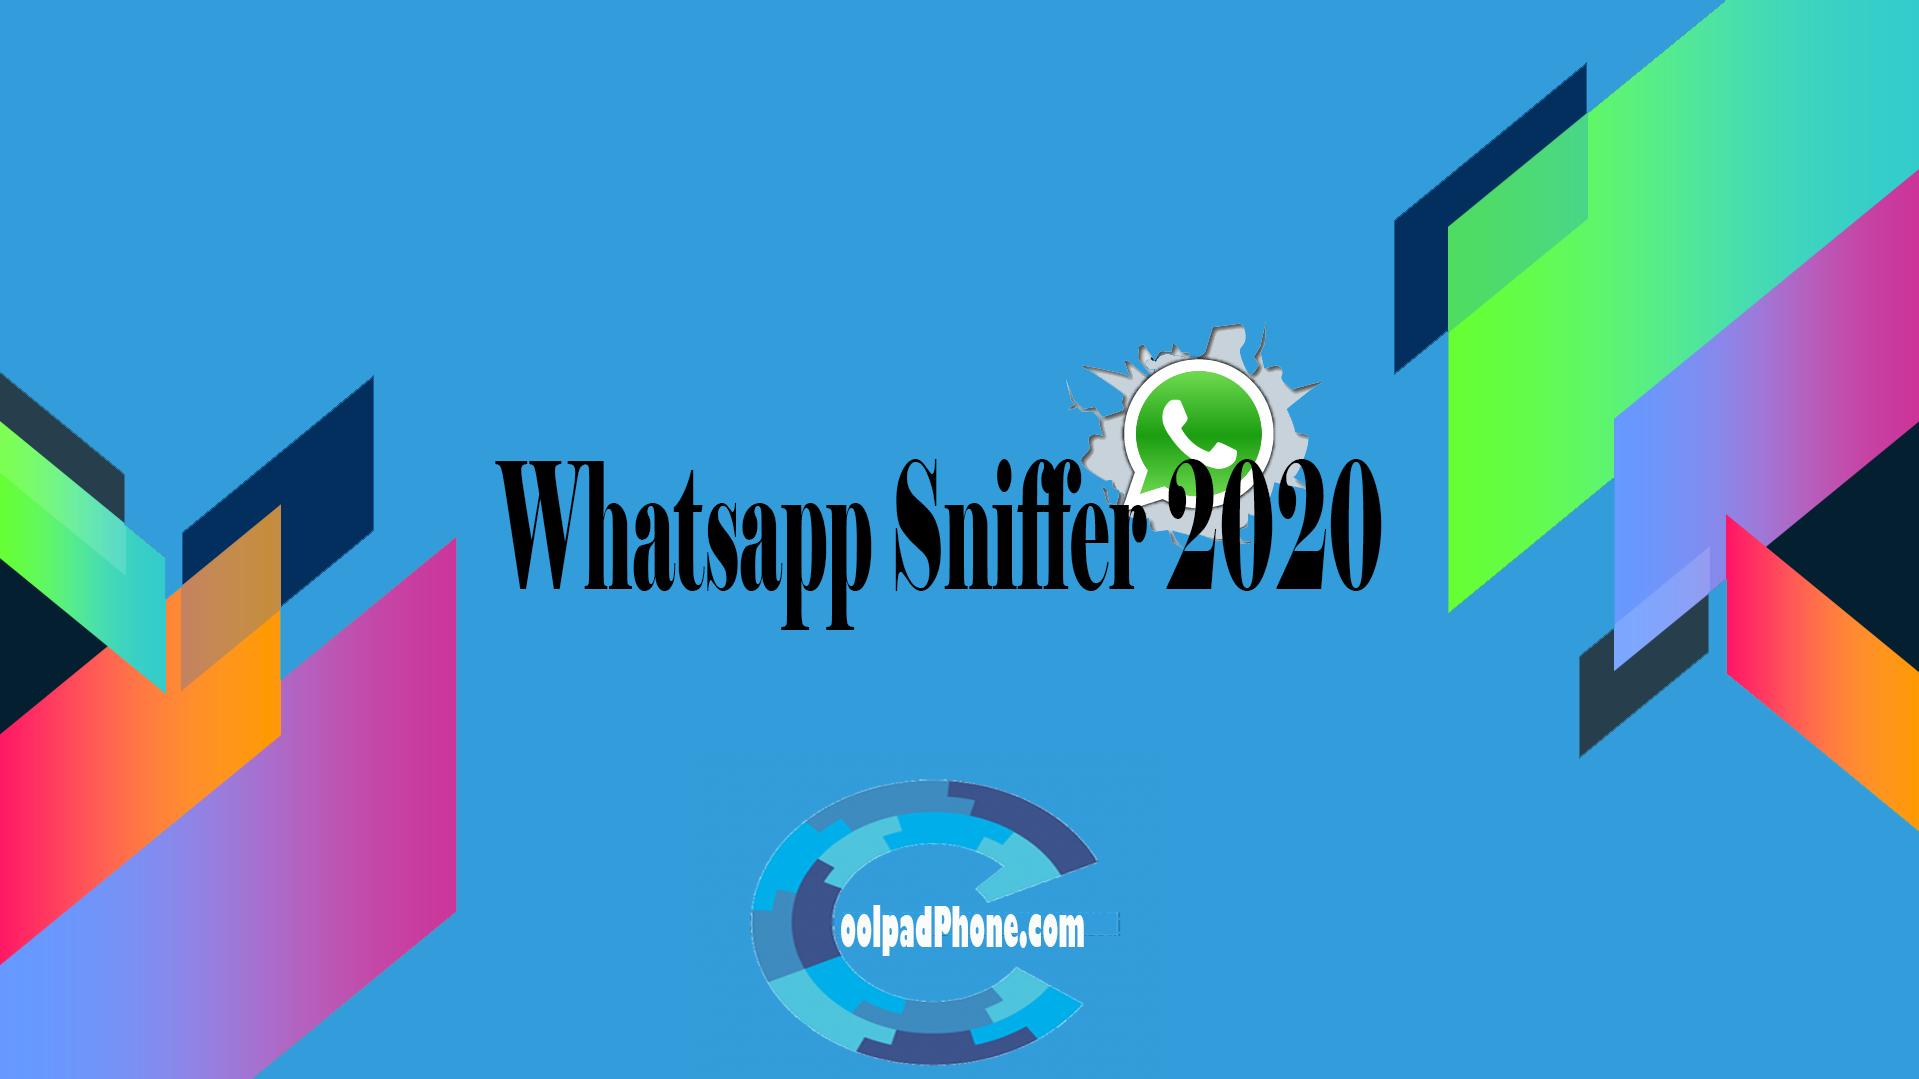 Whatsapp Sniffer 2020